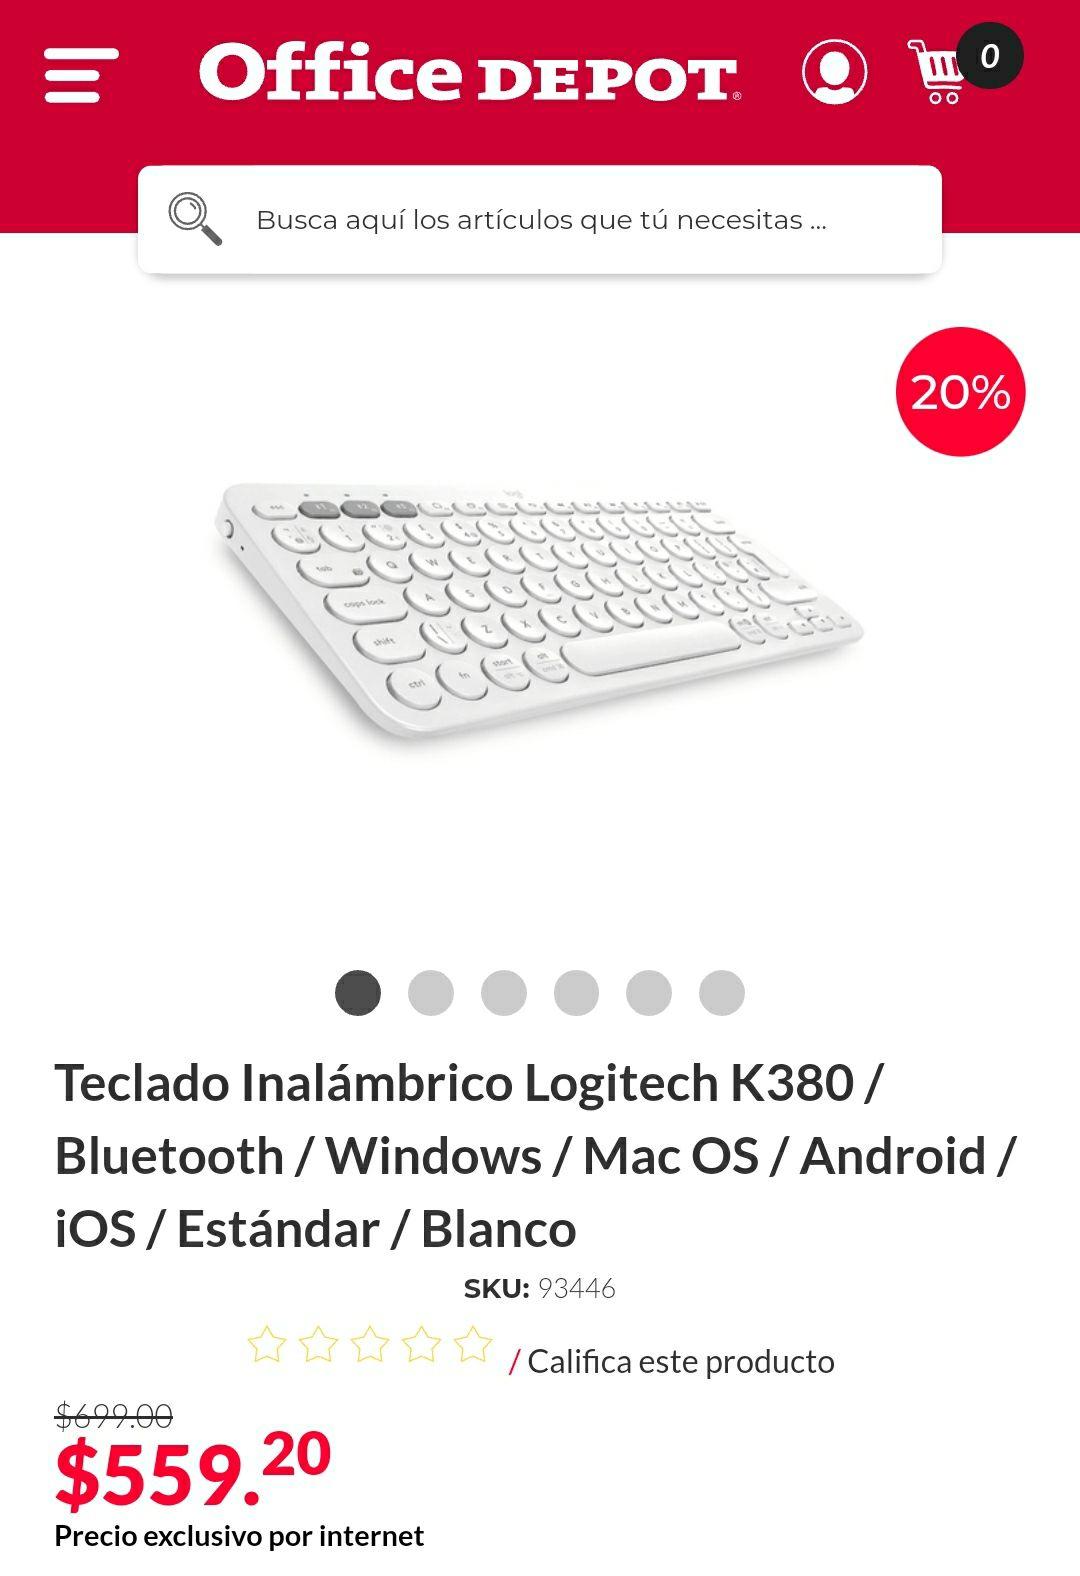 Office Depot, Teclado Bluetooth Logitech k380